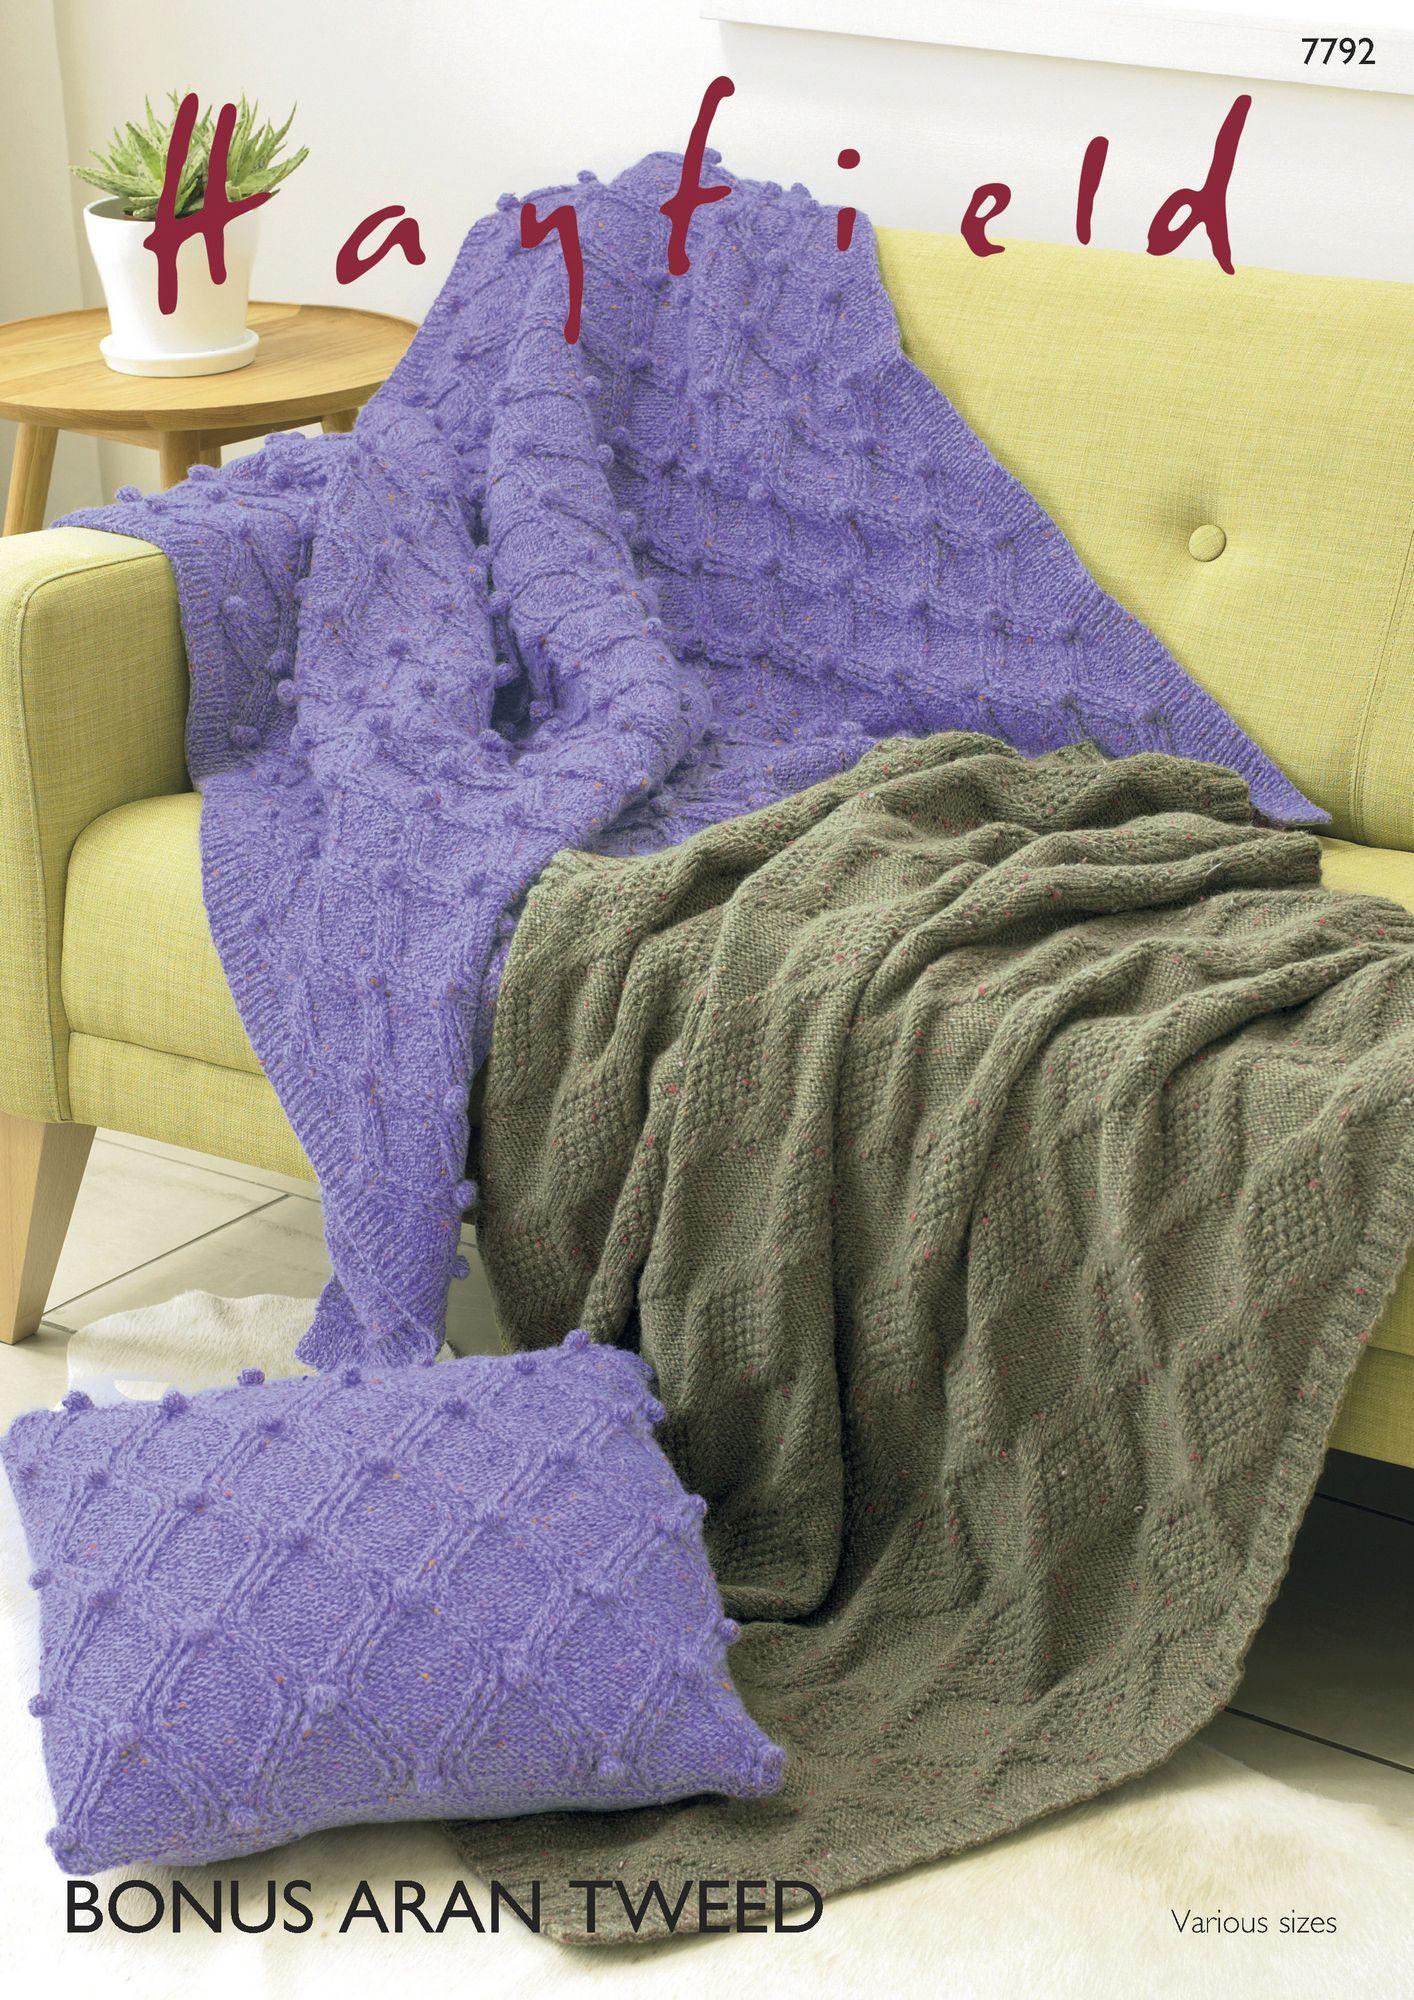 Blankets and Cushion Cover in Hayfield Bonus Aran Tweed ...